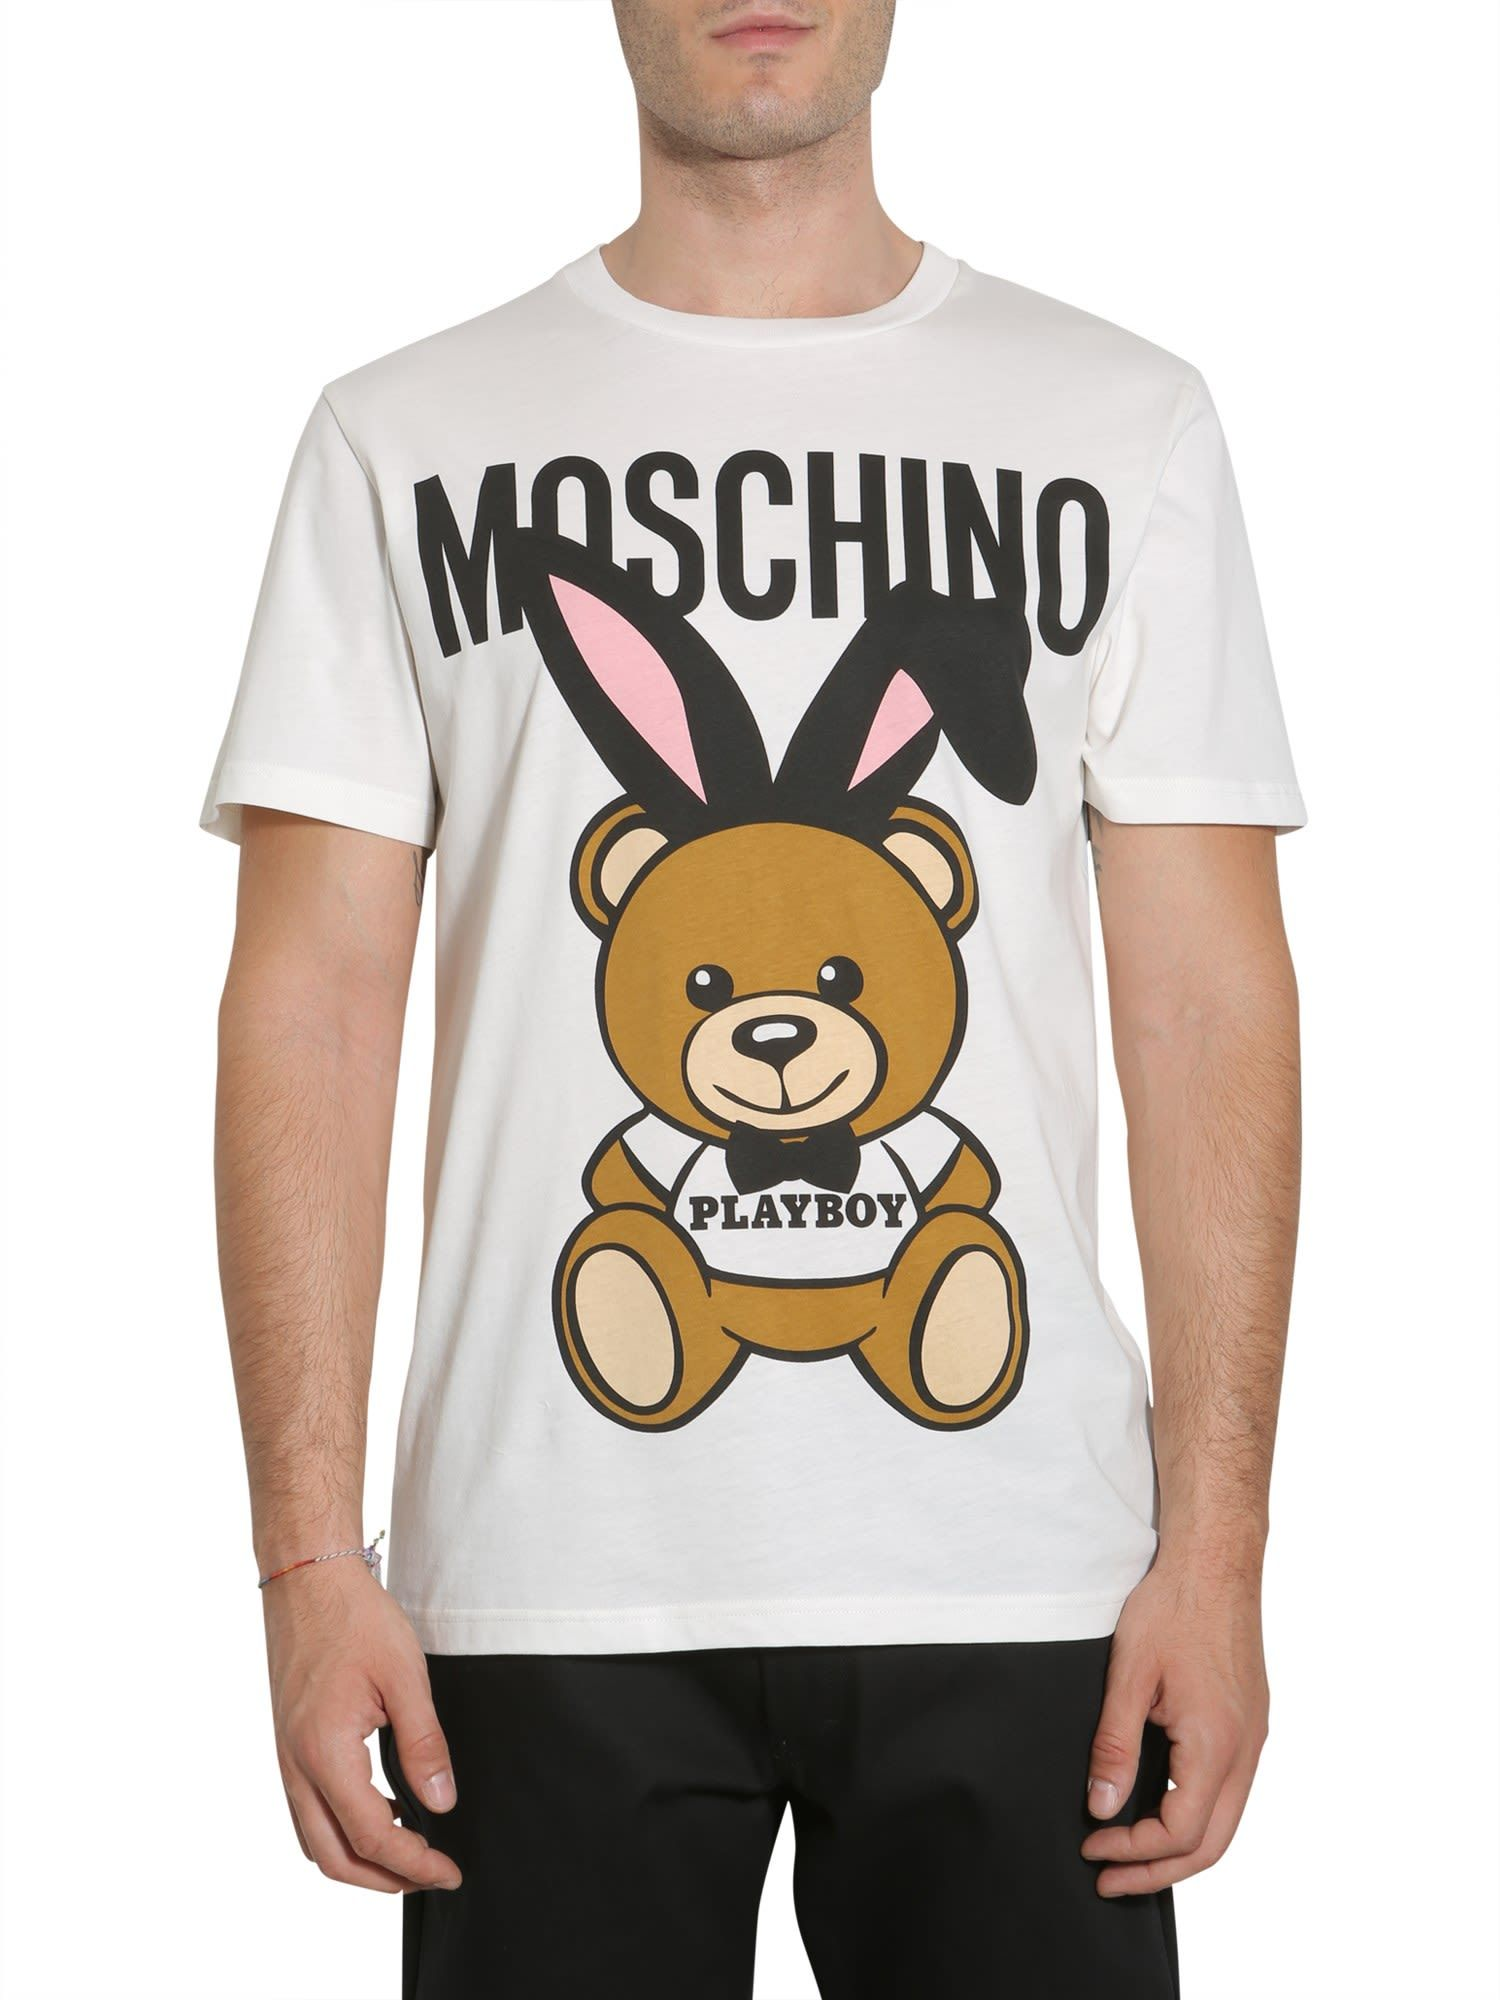 066aa15a86f MOSCHINO PLAYBOY TEDDY BEAR T-SHIRT.  moschino  cloth